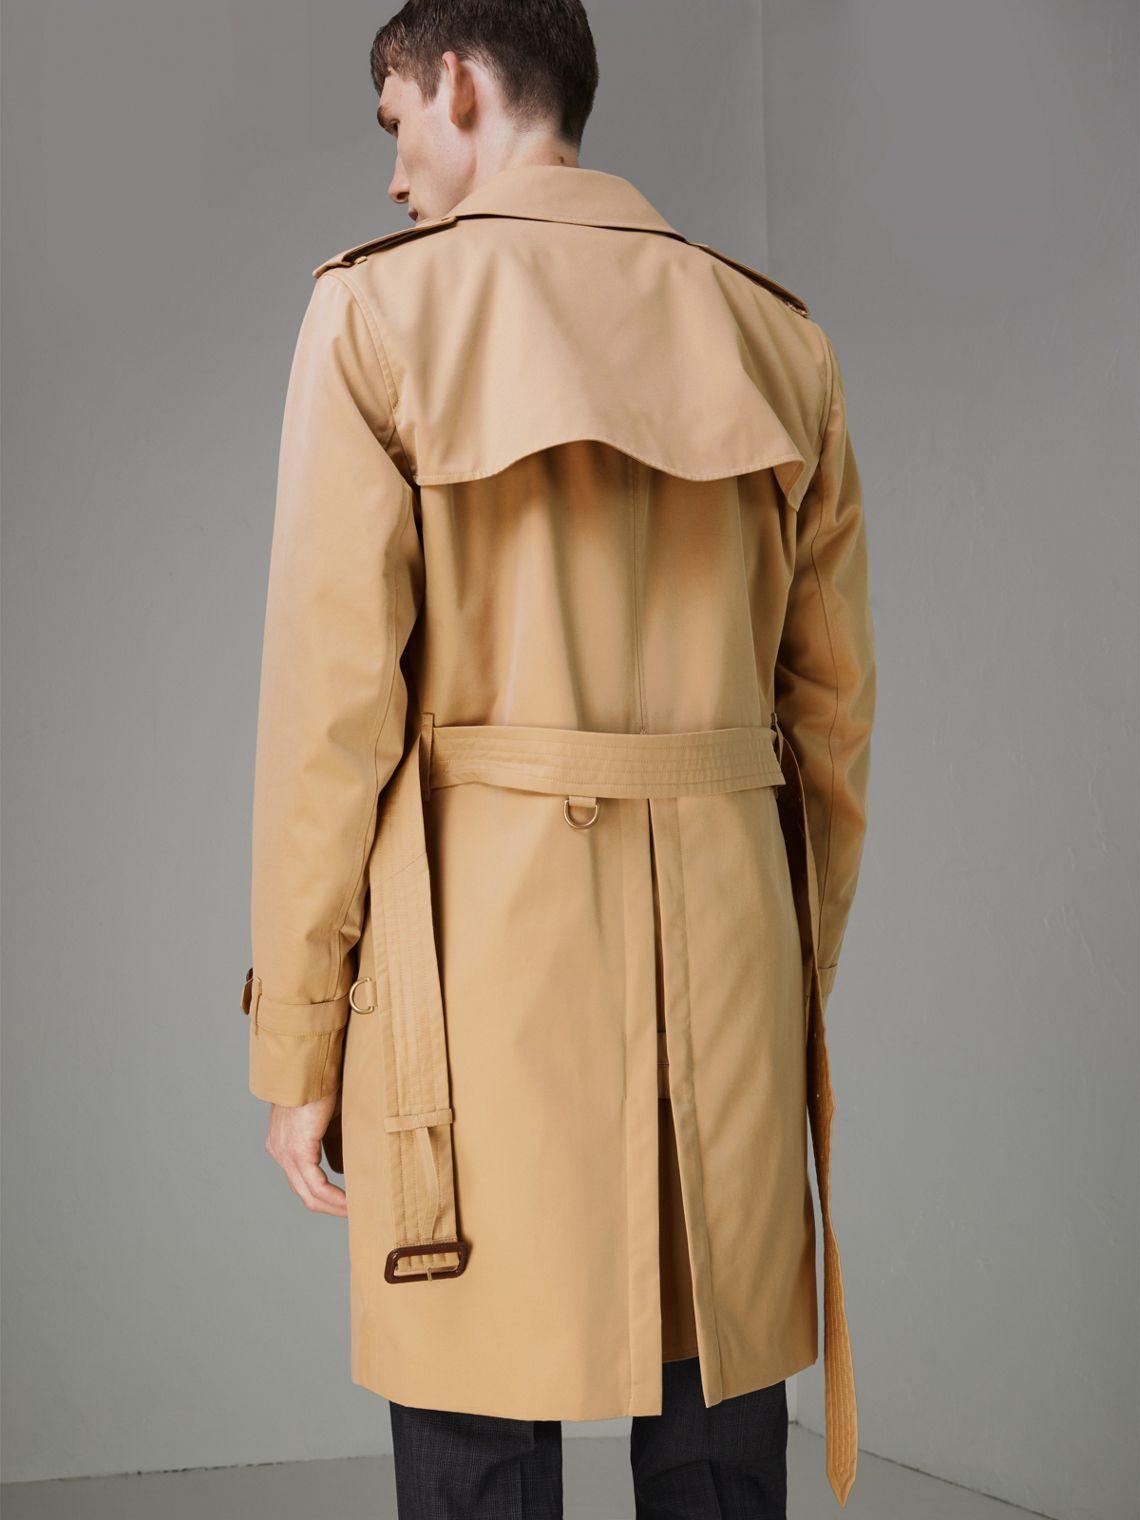 18ae4603348b The Kensington Heritage Trench Coat in Honey - Men